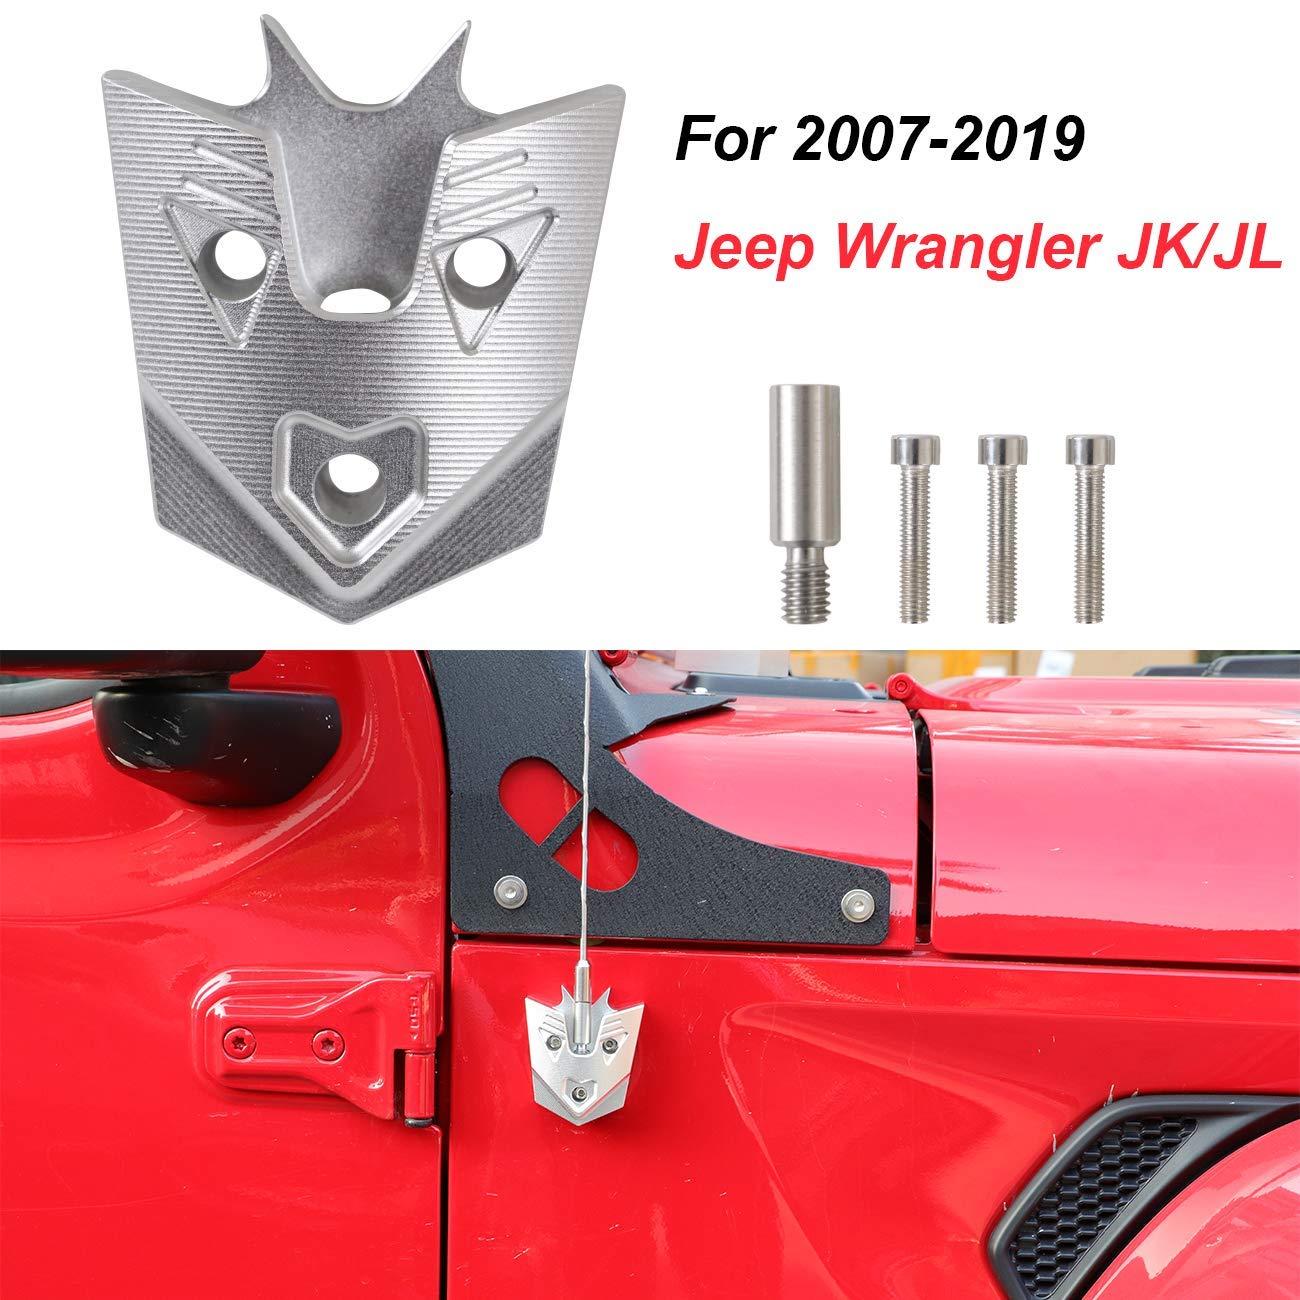 Jeep Wrangler JL /& JK Accessories /& Jeep Aerial 5.7 Red Heavy Gauge Billet Aluminum Antenna Replacement AM FM Radio Signal Reception for Jeep Wrangler JK /& JL /& TJ 1997-2019